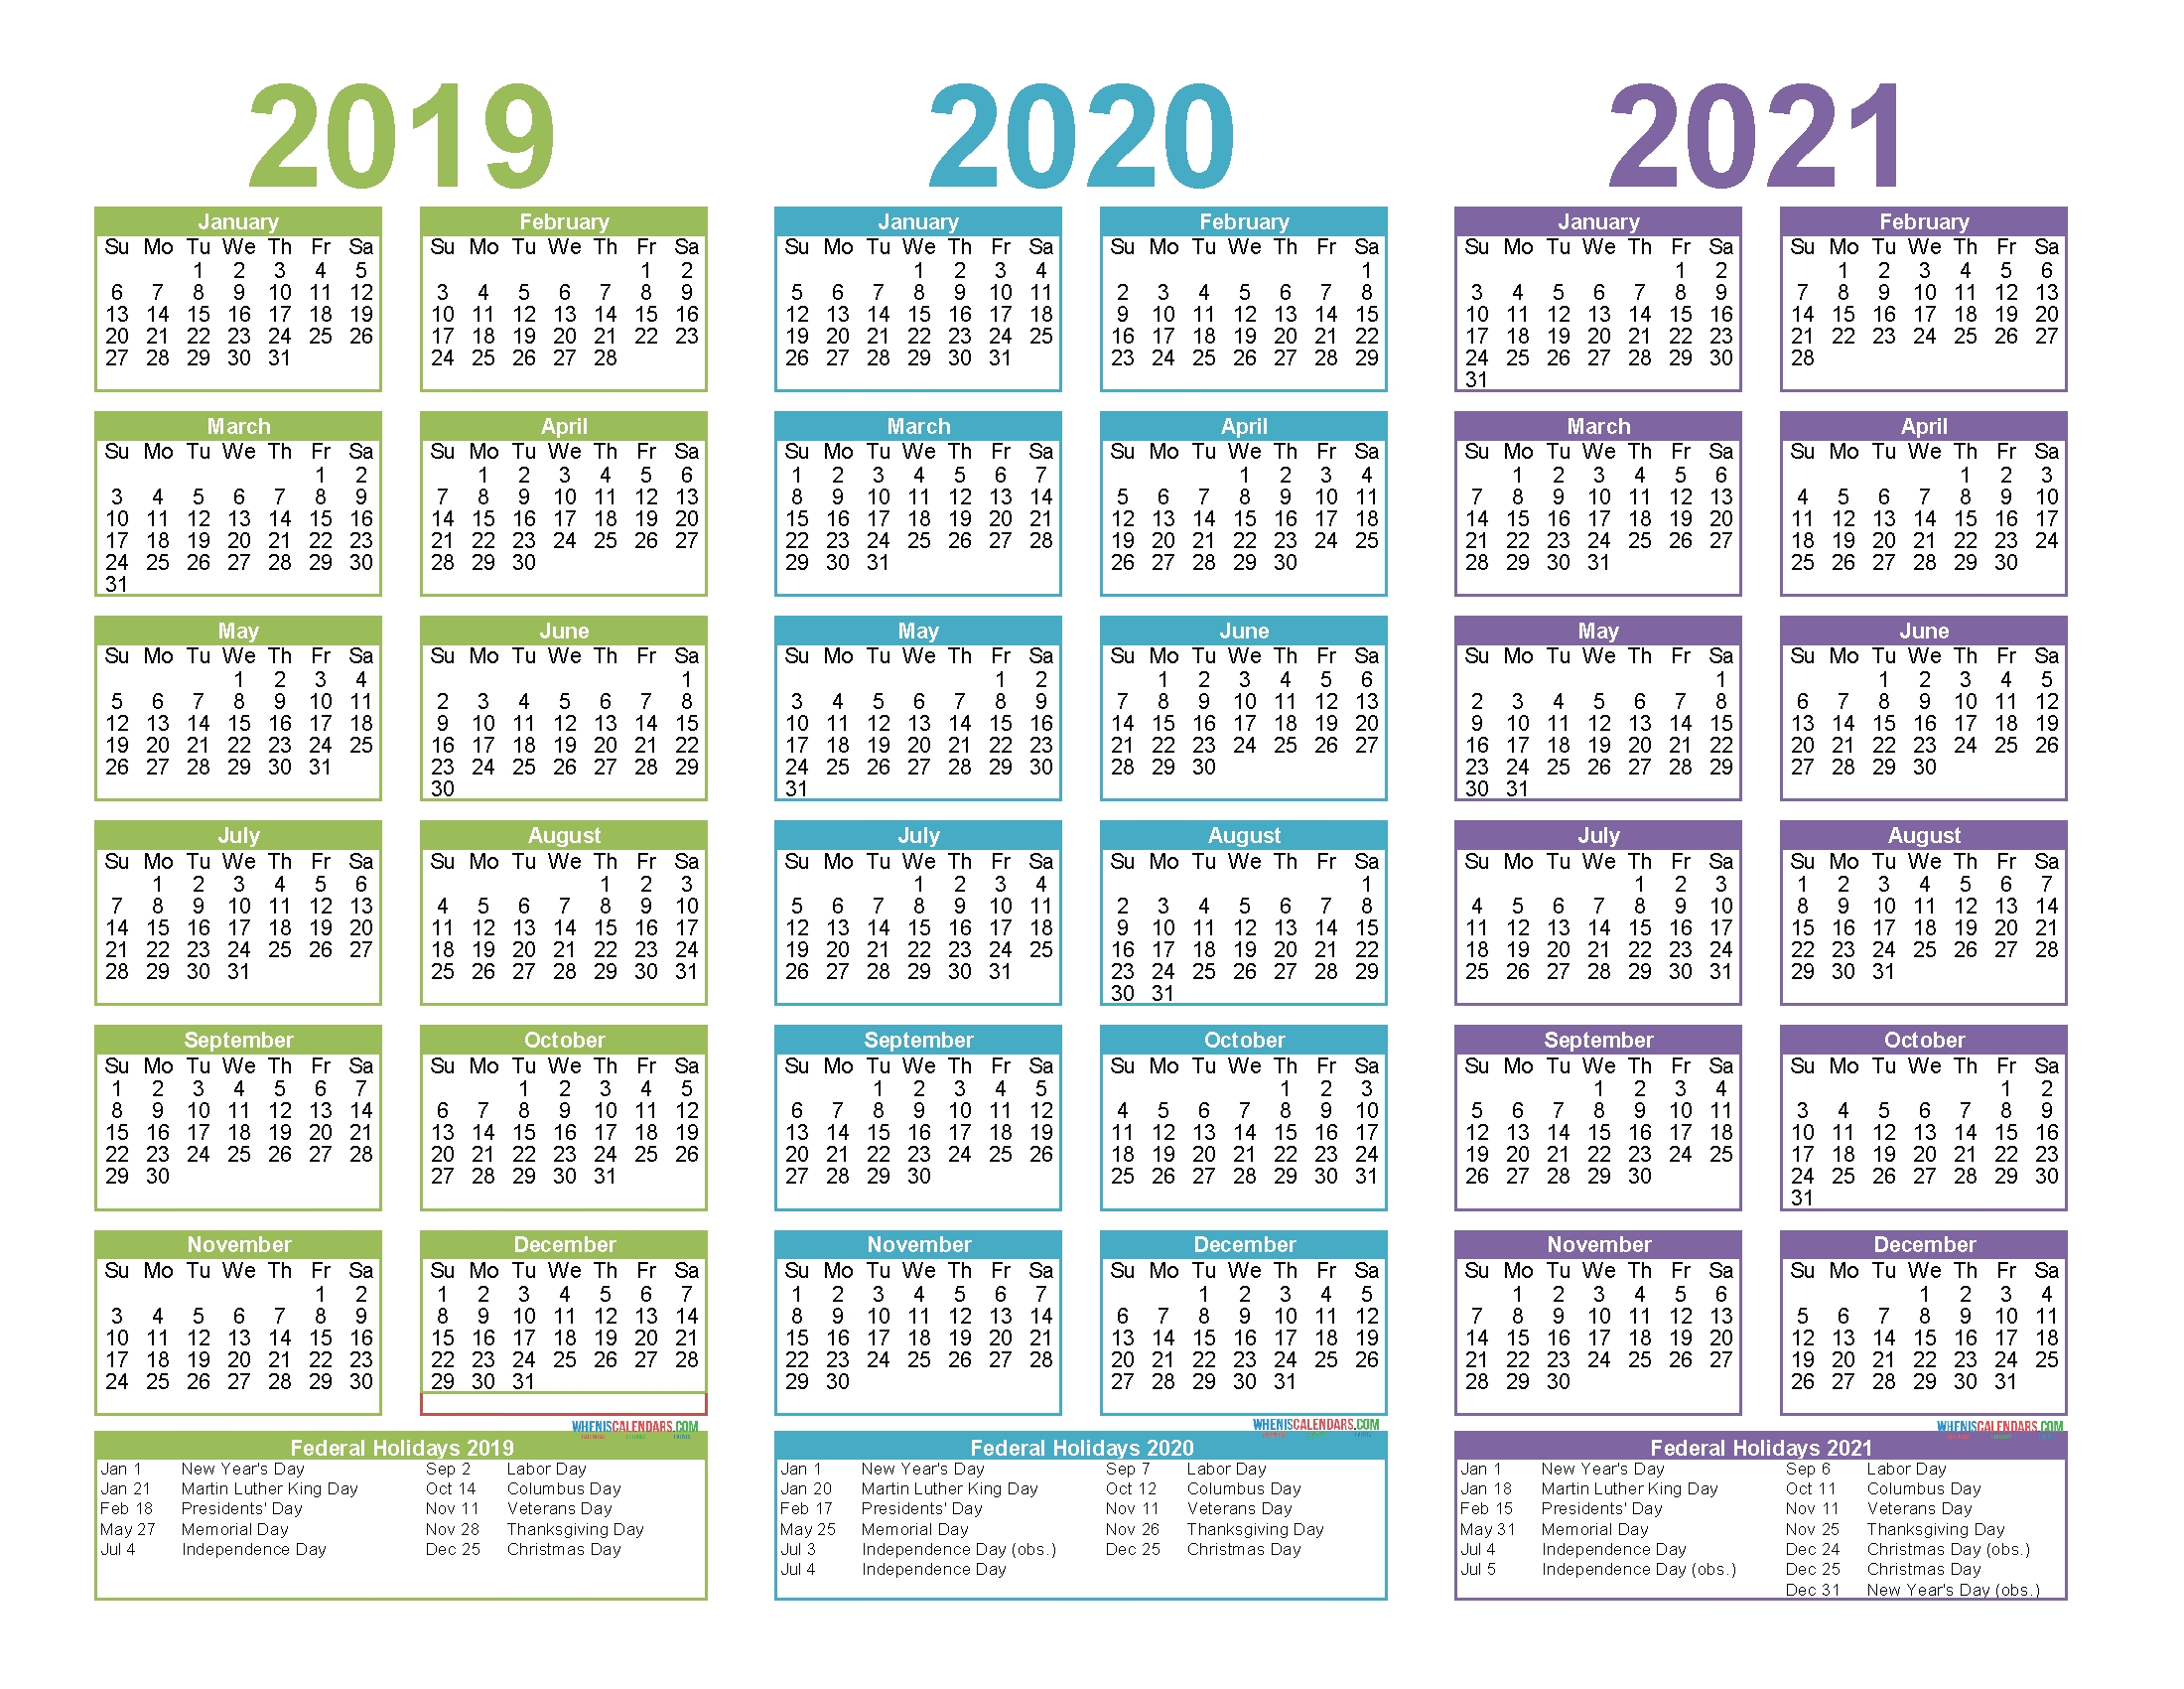 2019 To 2021 3 Year Calendar Printable Free Pdf, Word, Image regarding Three-Year Calendar 2019 2020 2021